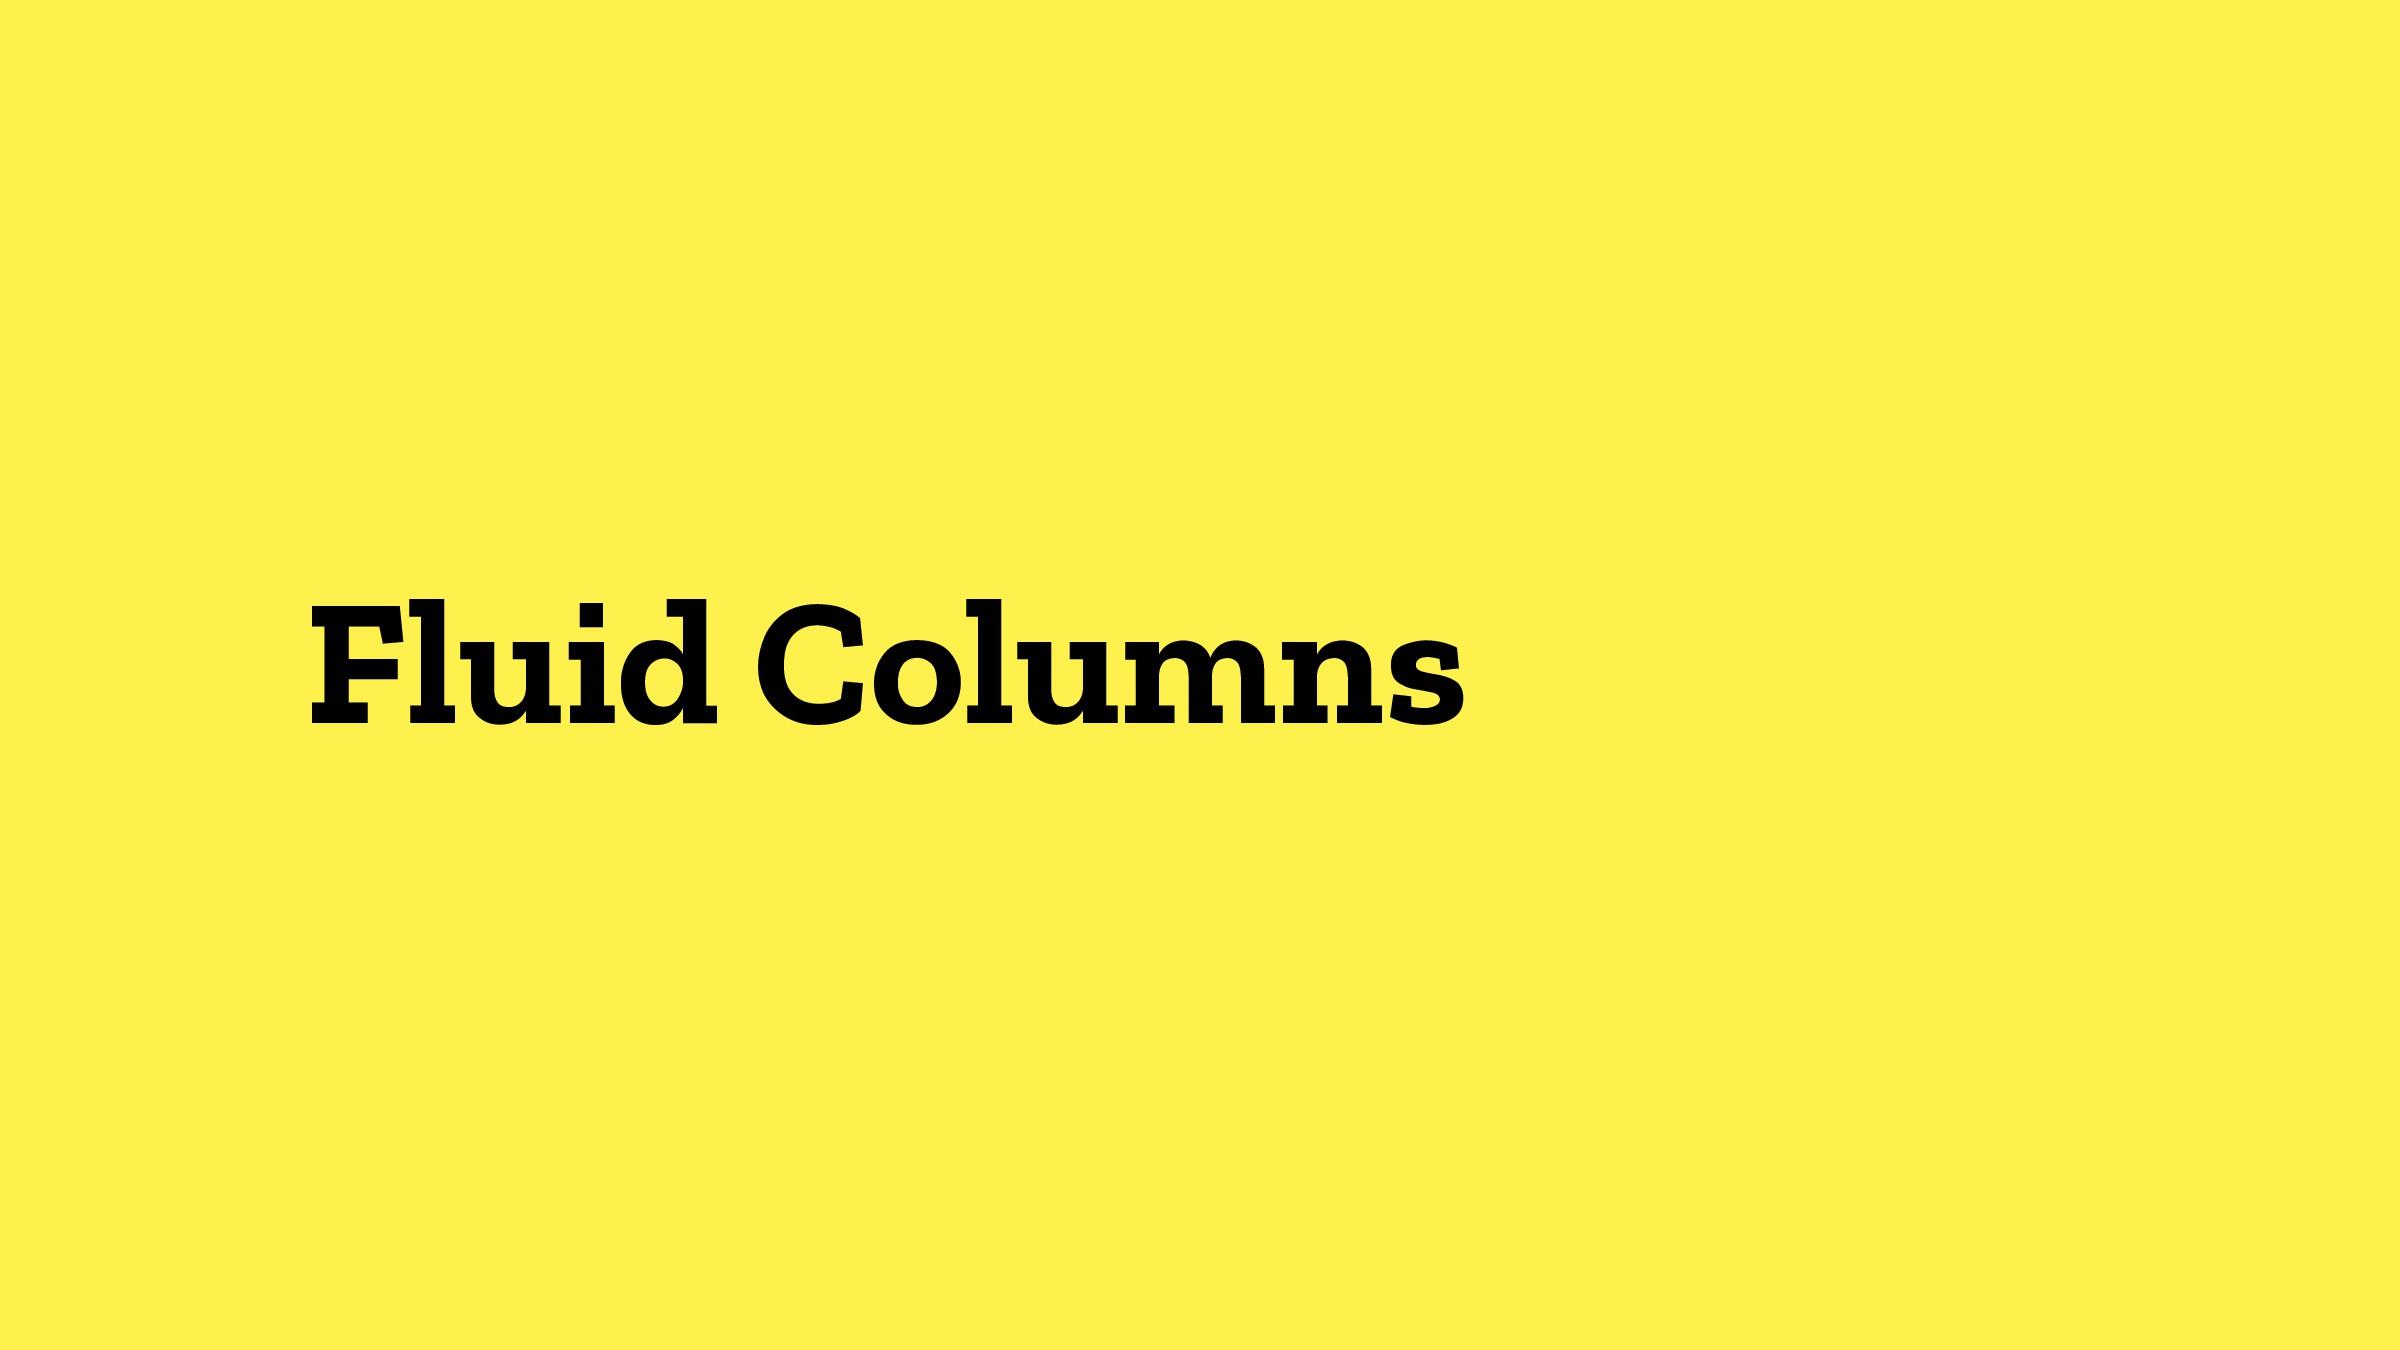 Fluid Columns